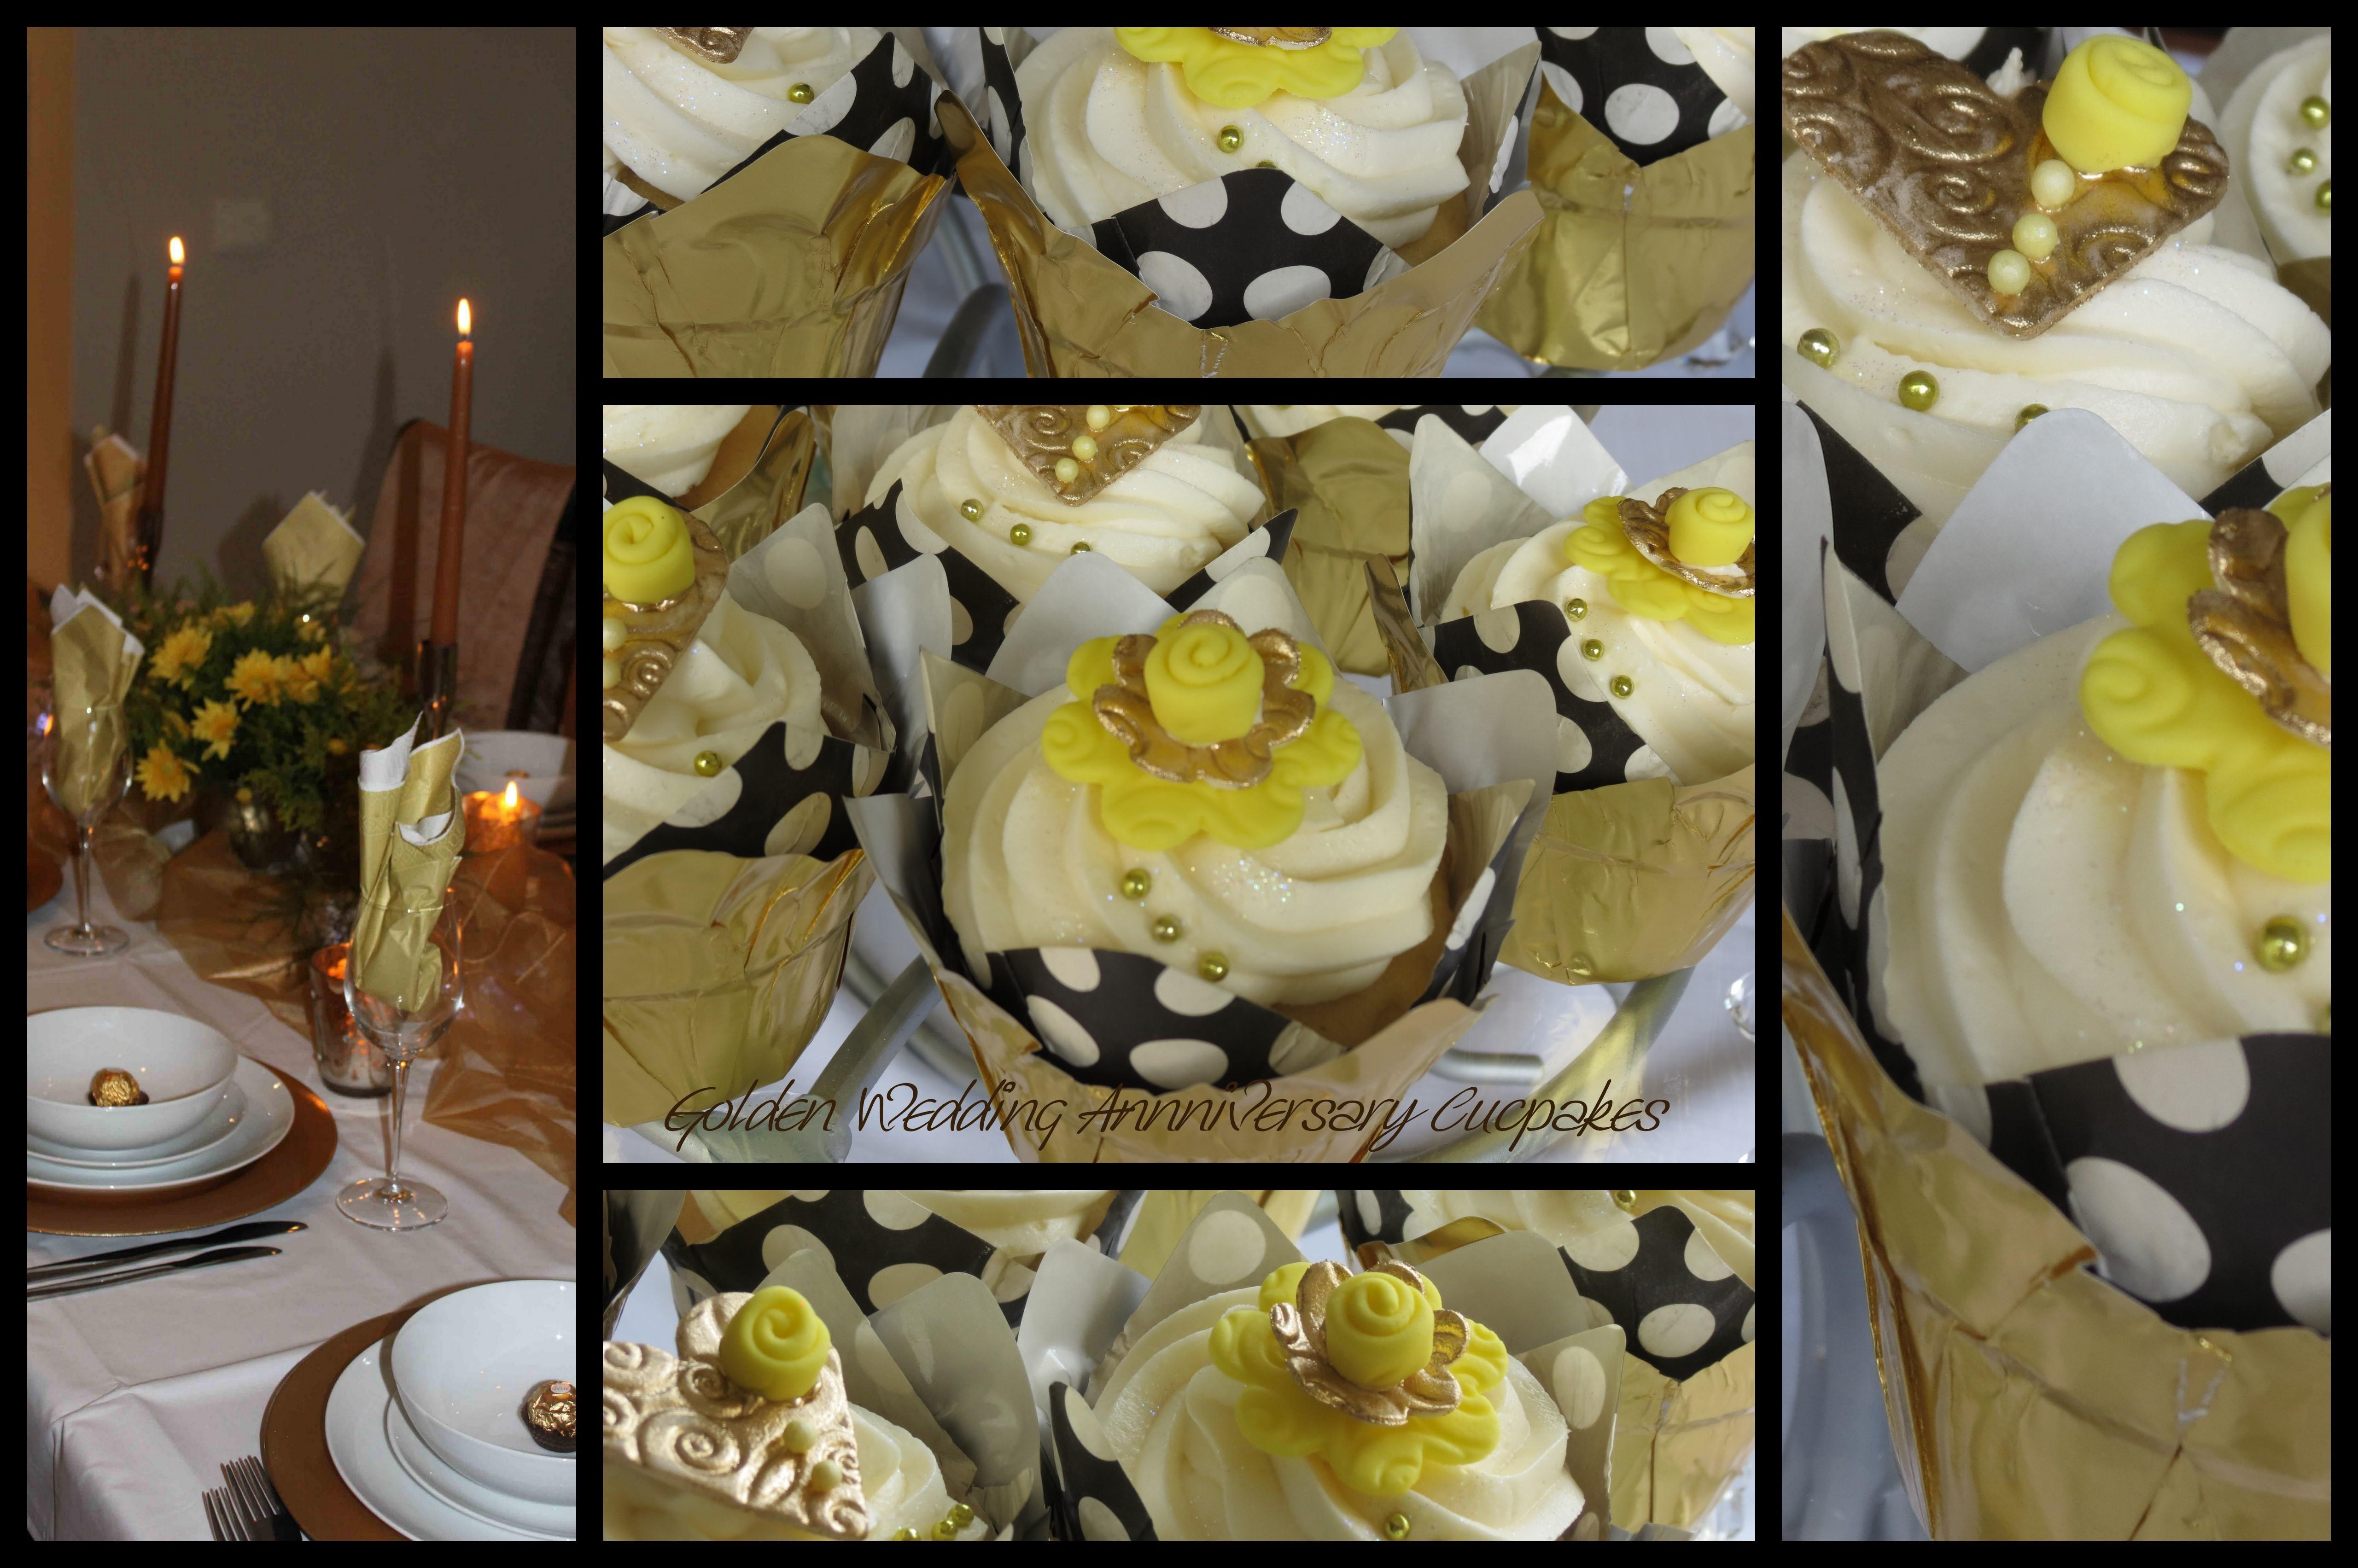 Golden Wedding Anniversary Table Decorations